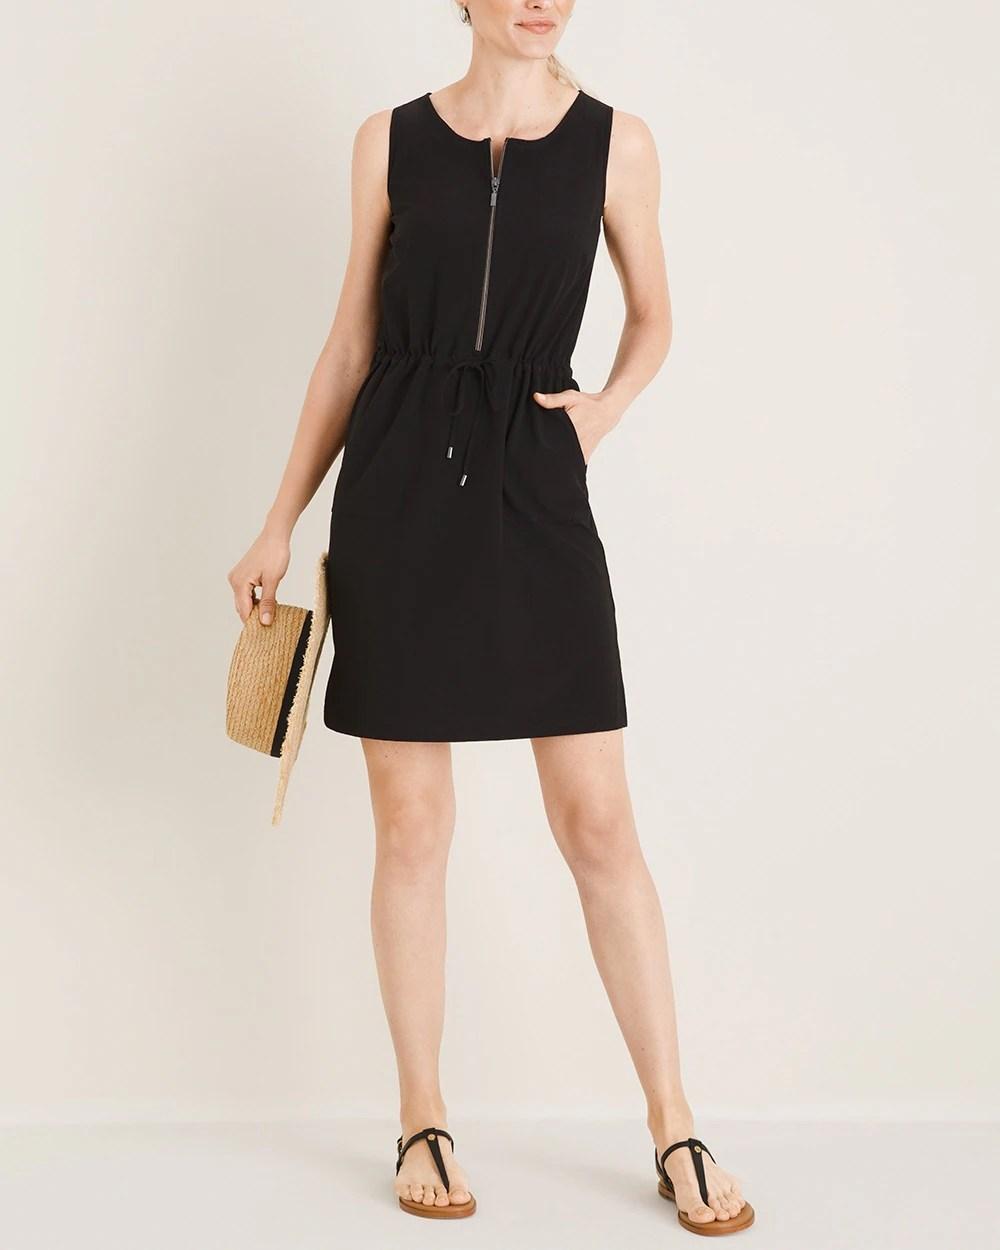 Chic360 Dress